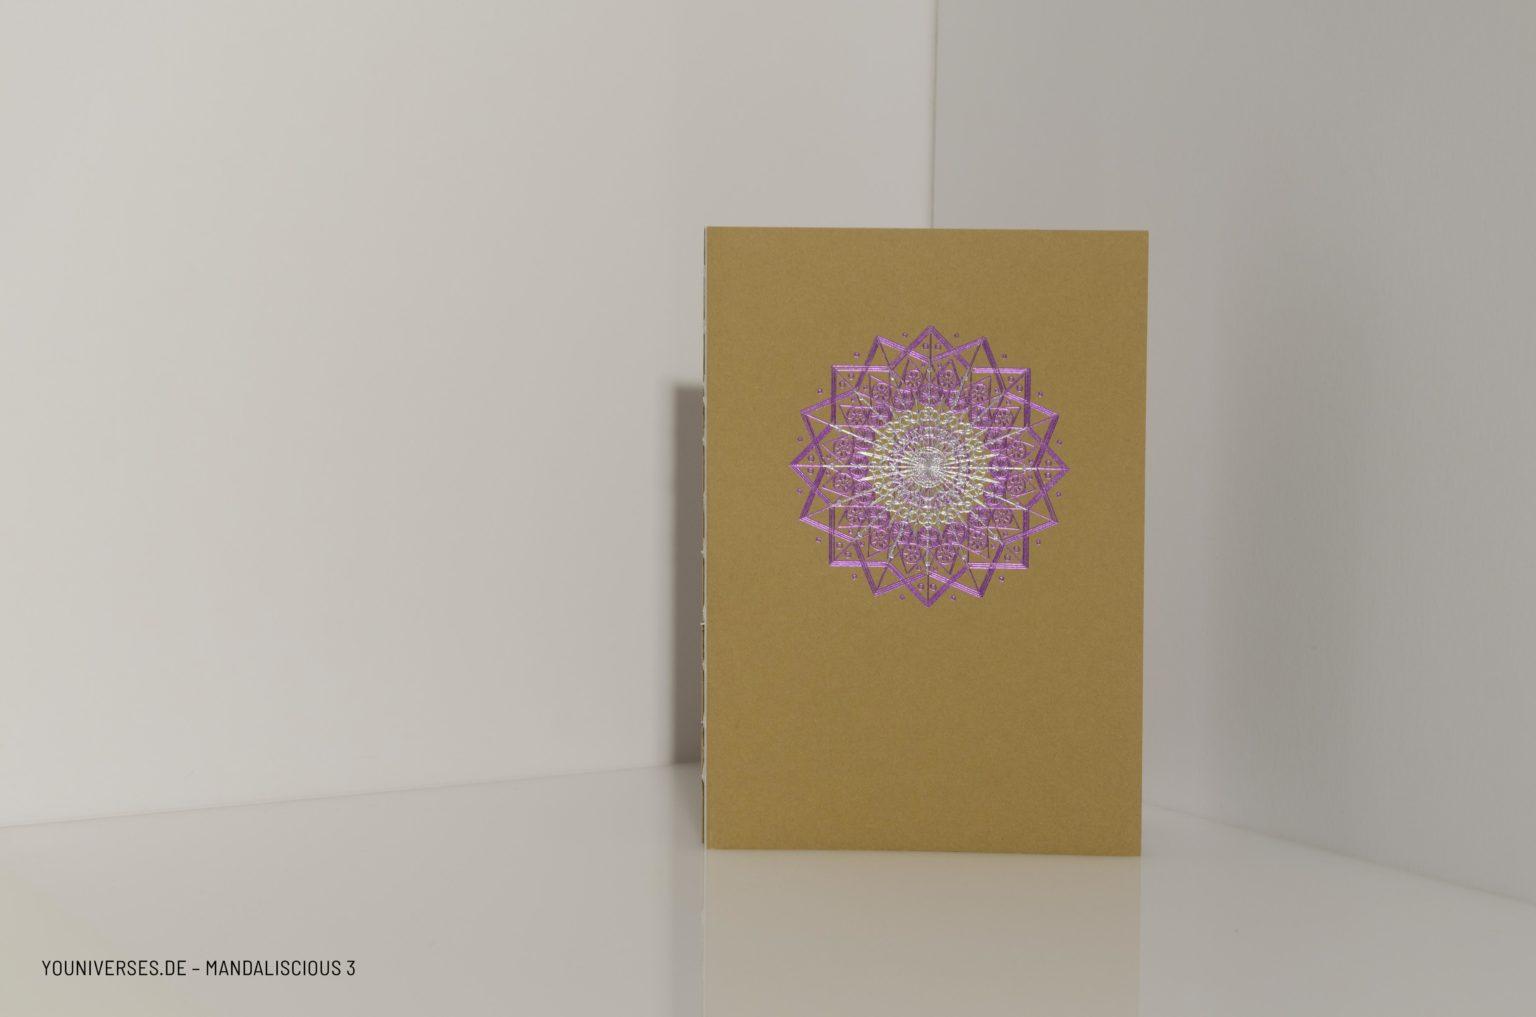 Youniverses, Reihe: mandaliscious Design-N°.: 3 Farben: Violett & Silber, Yournal, Journal, Diary, Bulletjournal, Tagebuch, Skizzenbuch, Veredelung, DIY, Handmade, Papeterie.